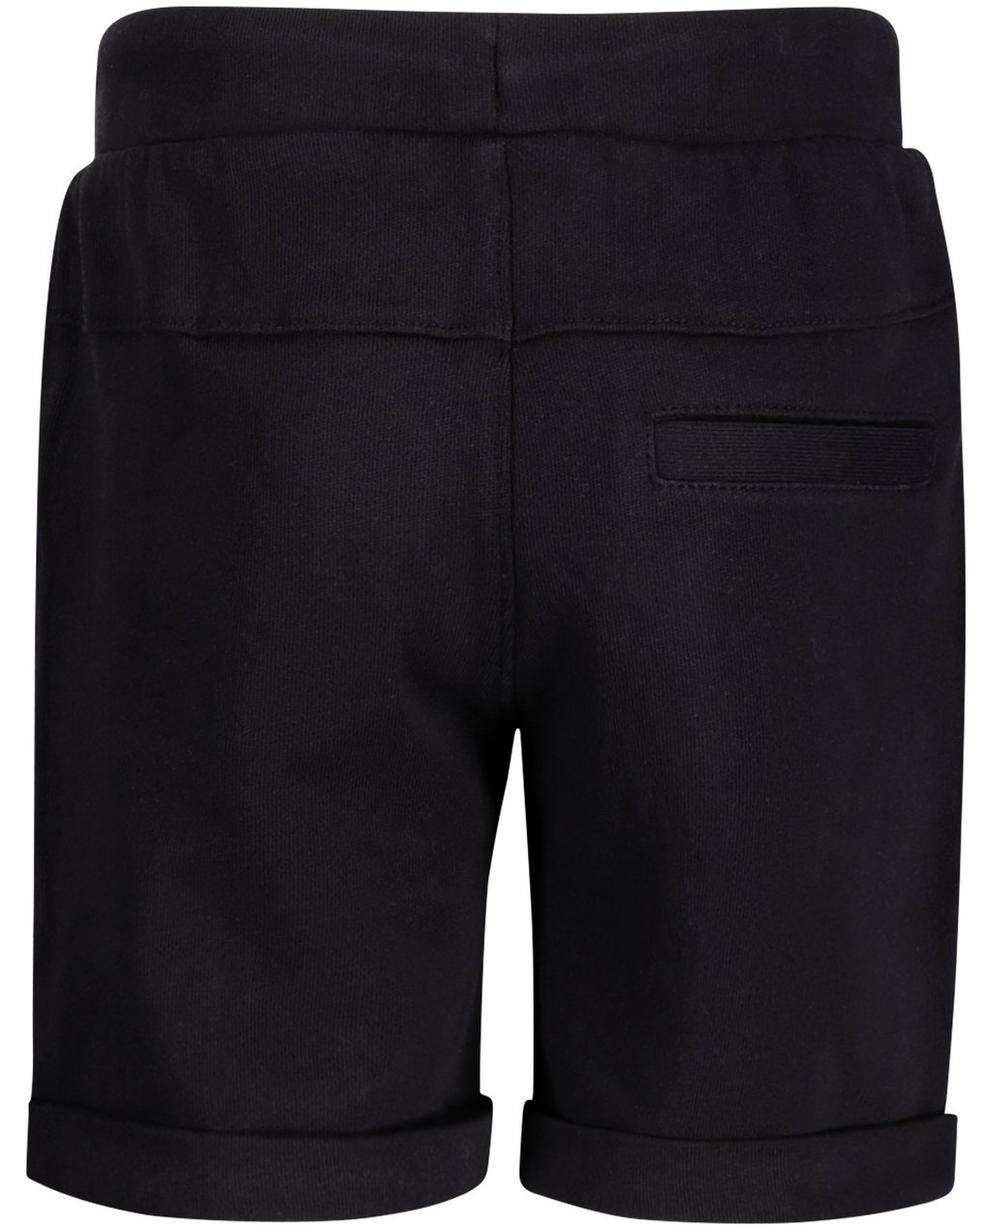 Shorts - Schwarz - Schwarze Sweatshorts